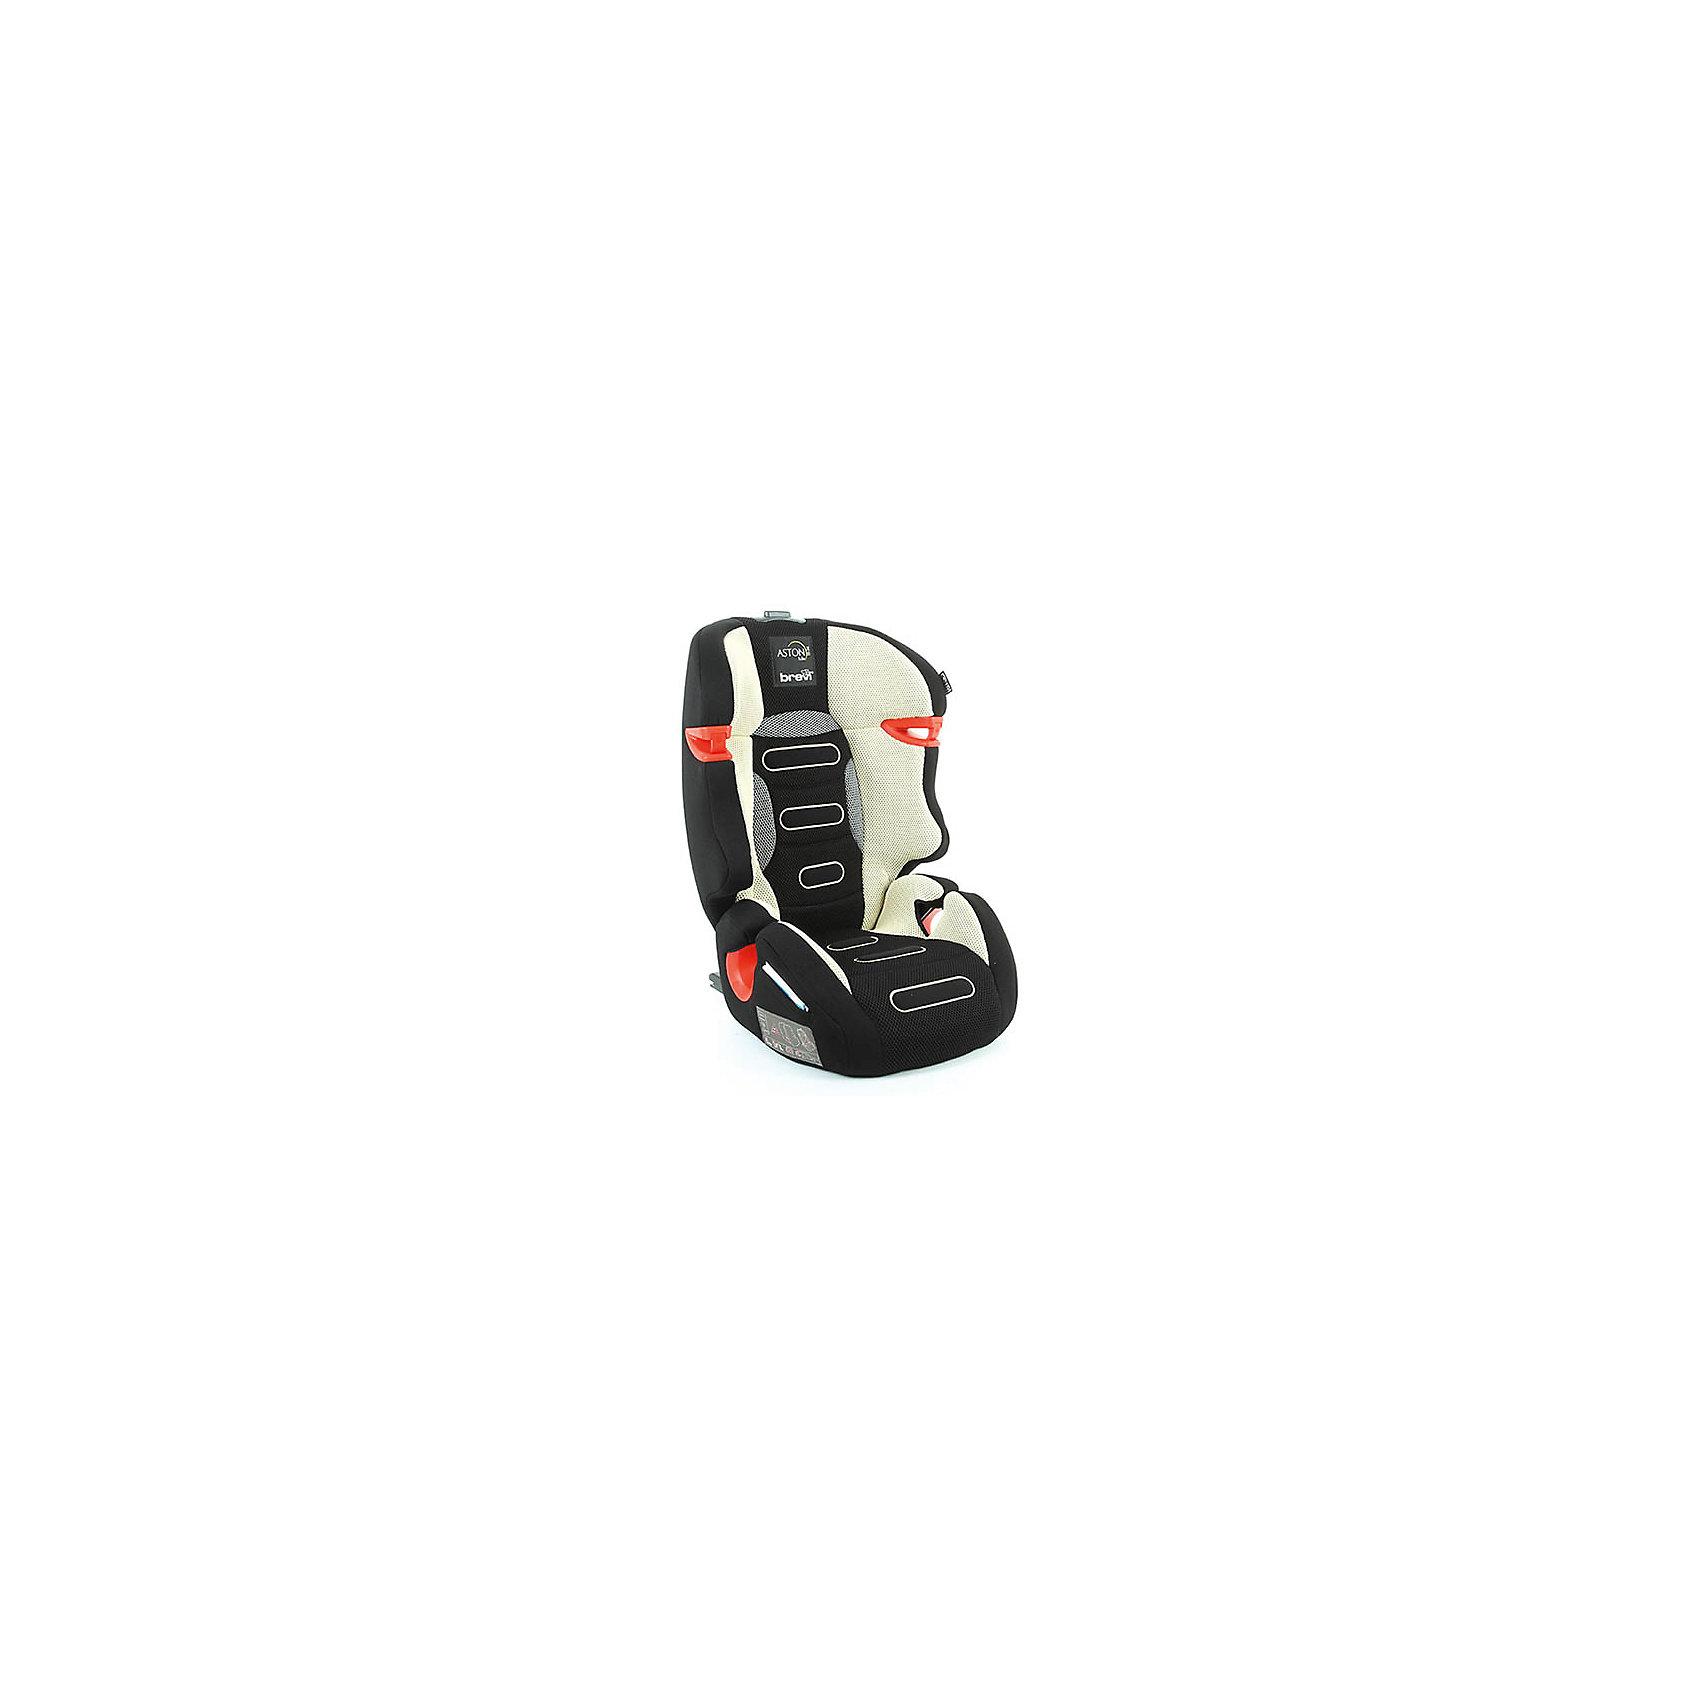 Автокресло ASTON B.Fix 15-36 кг., Brevi, бежевый/черный (brevi)